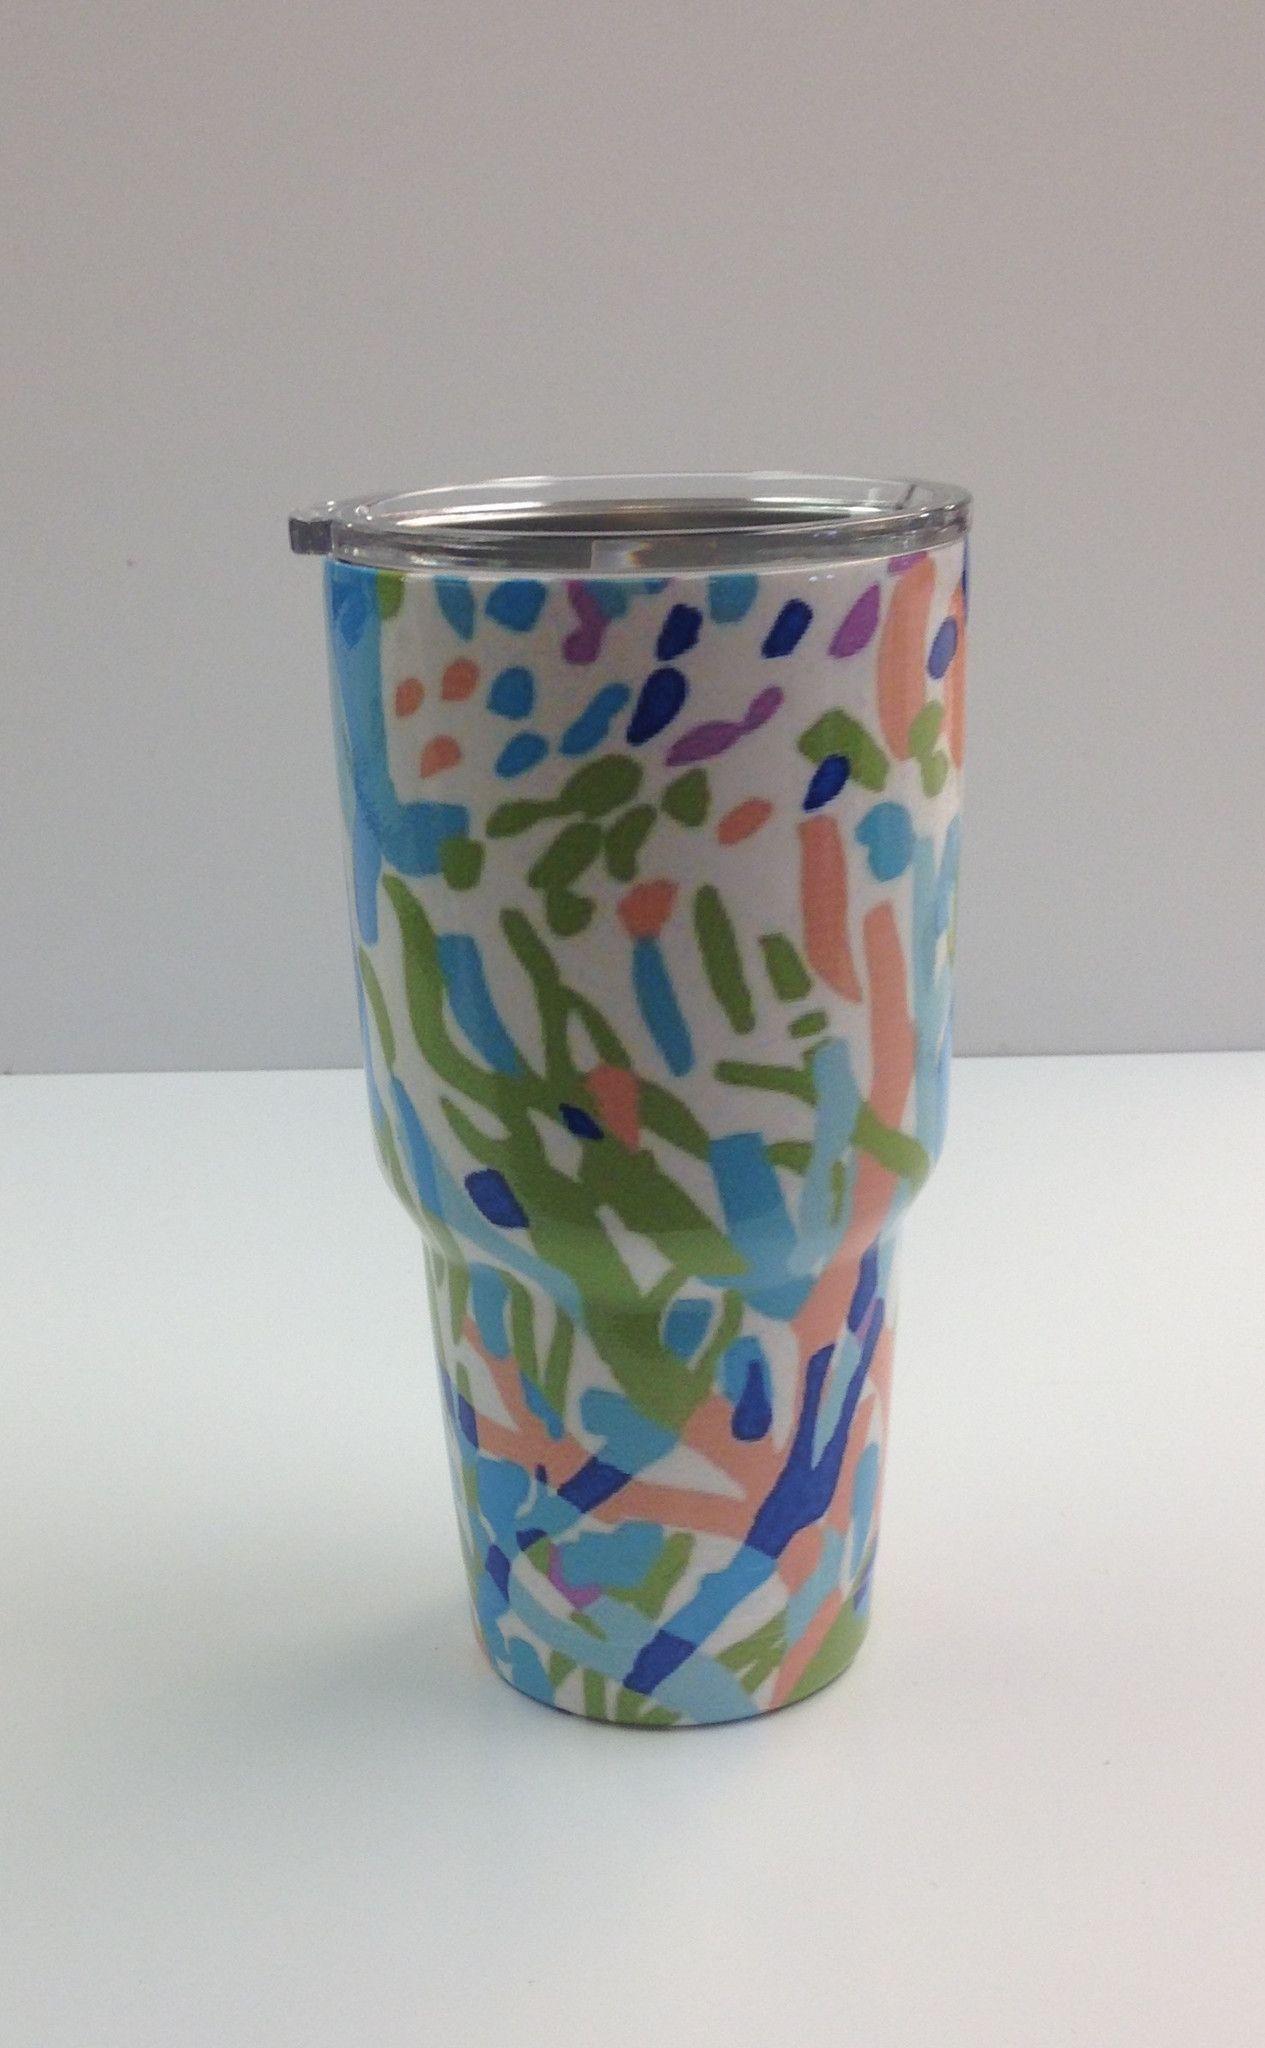 Yeti Rambler Oz Wrapped More Options Cow Pinterest - Sugar skull yeti cup